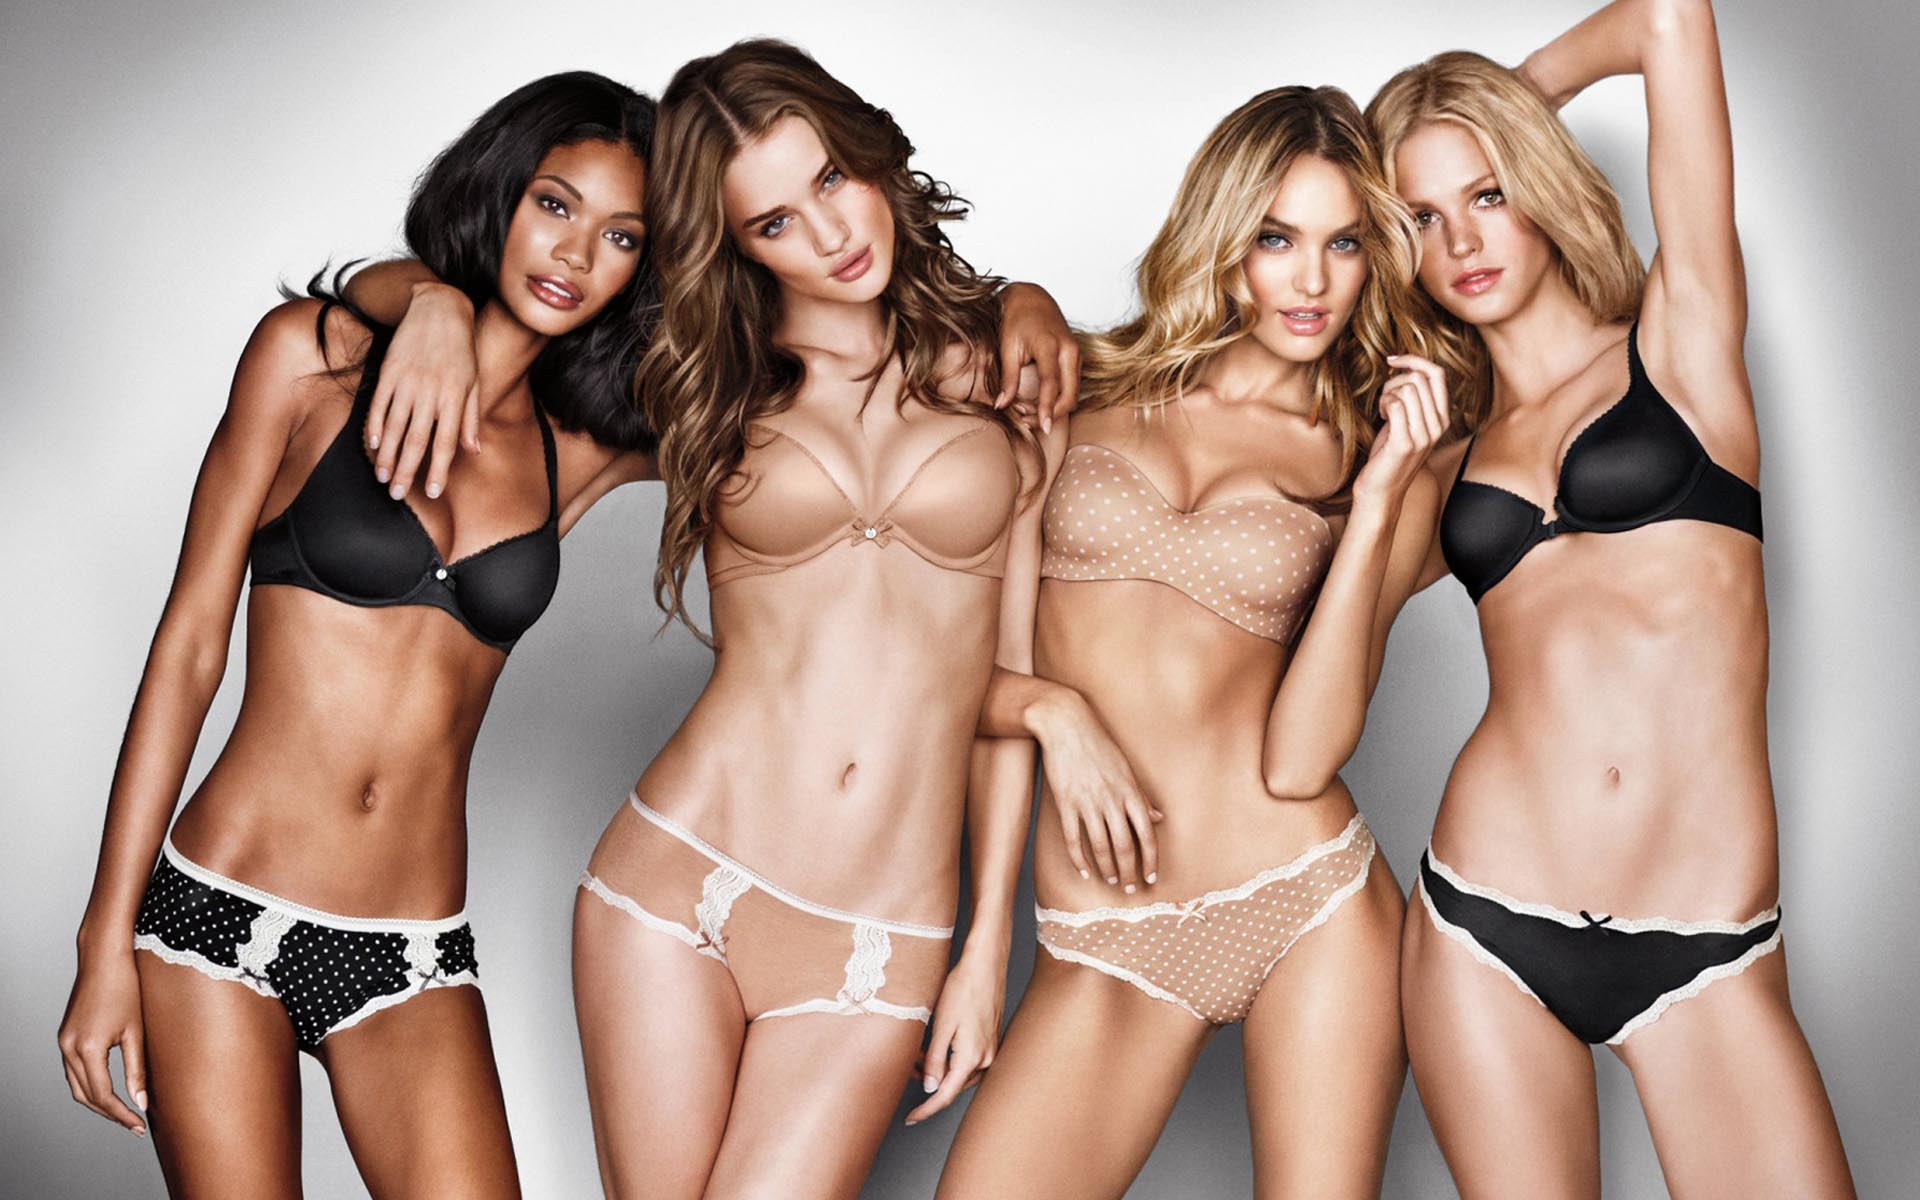 Modelli bikini estate 2015 Victoria's Secret